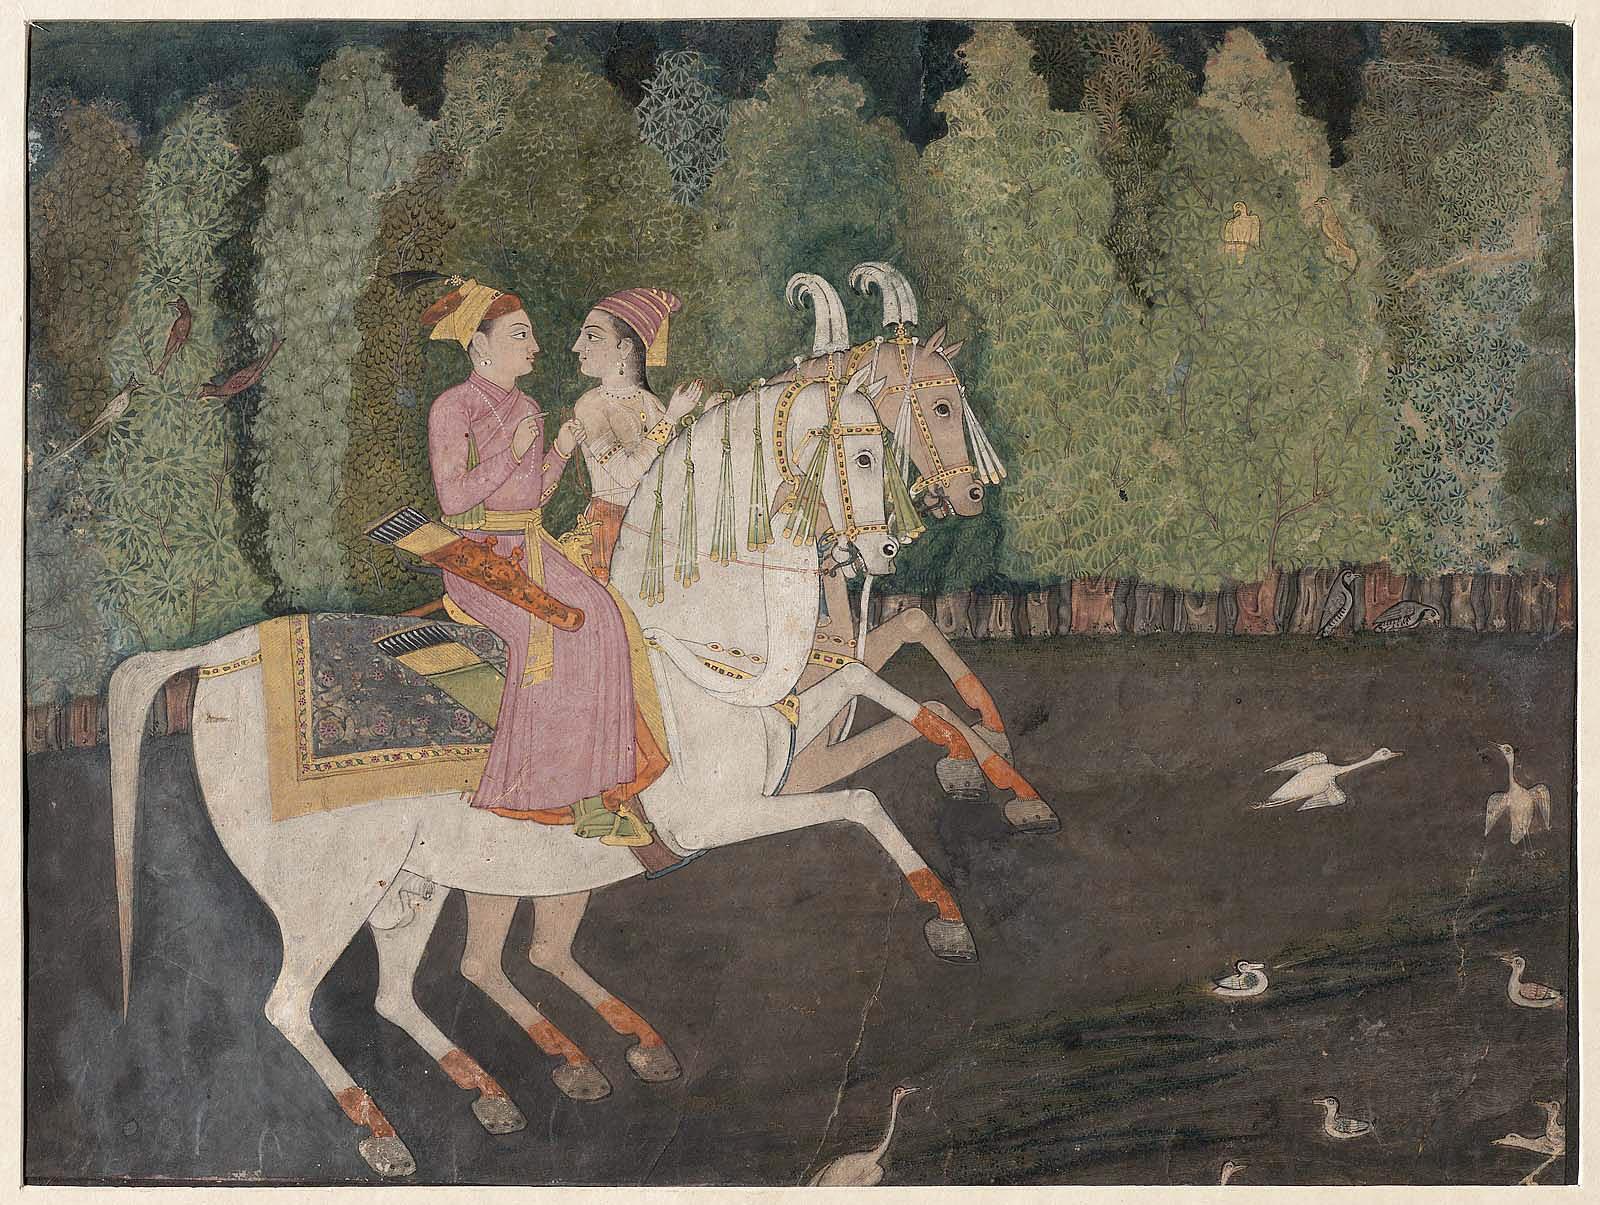 Hunting Scene: Prince and Princess on Horseback, 18th century, Mughal Empire